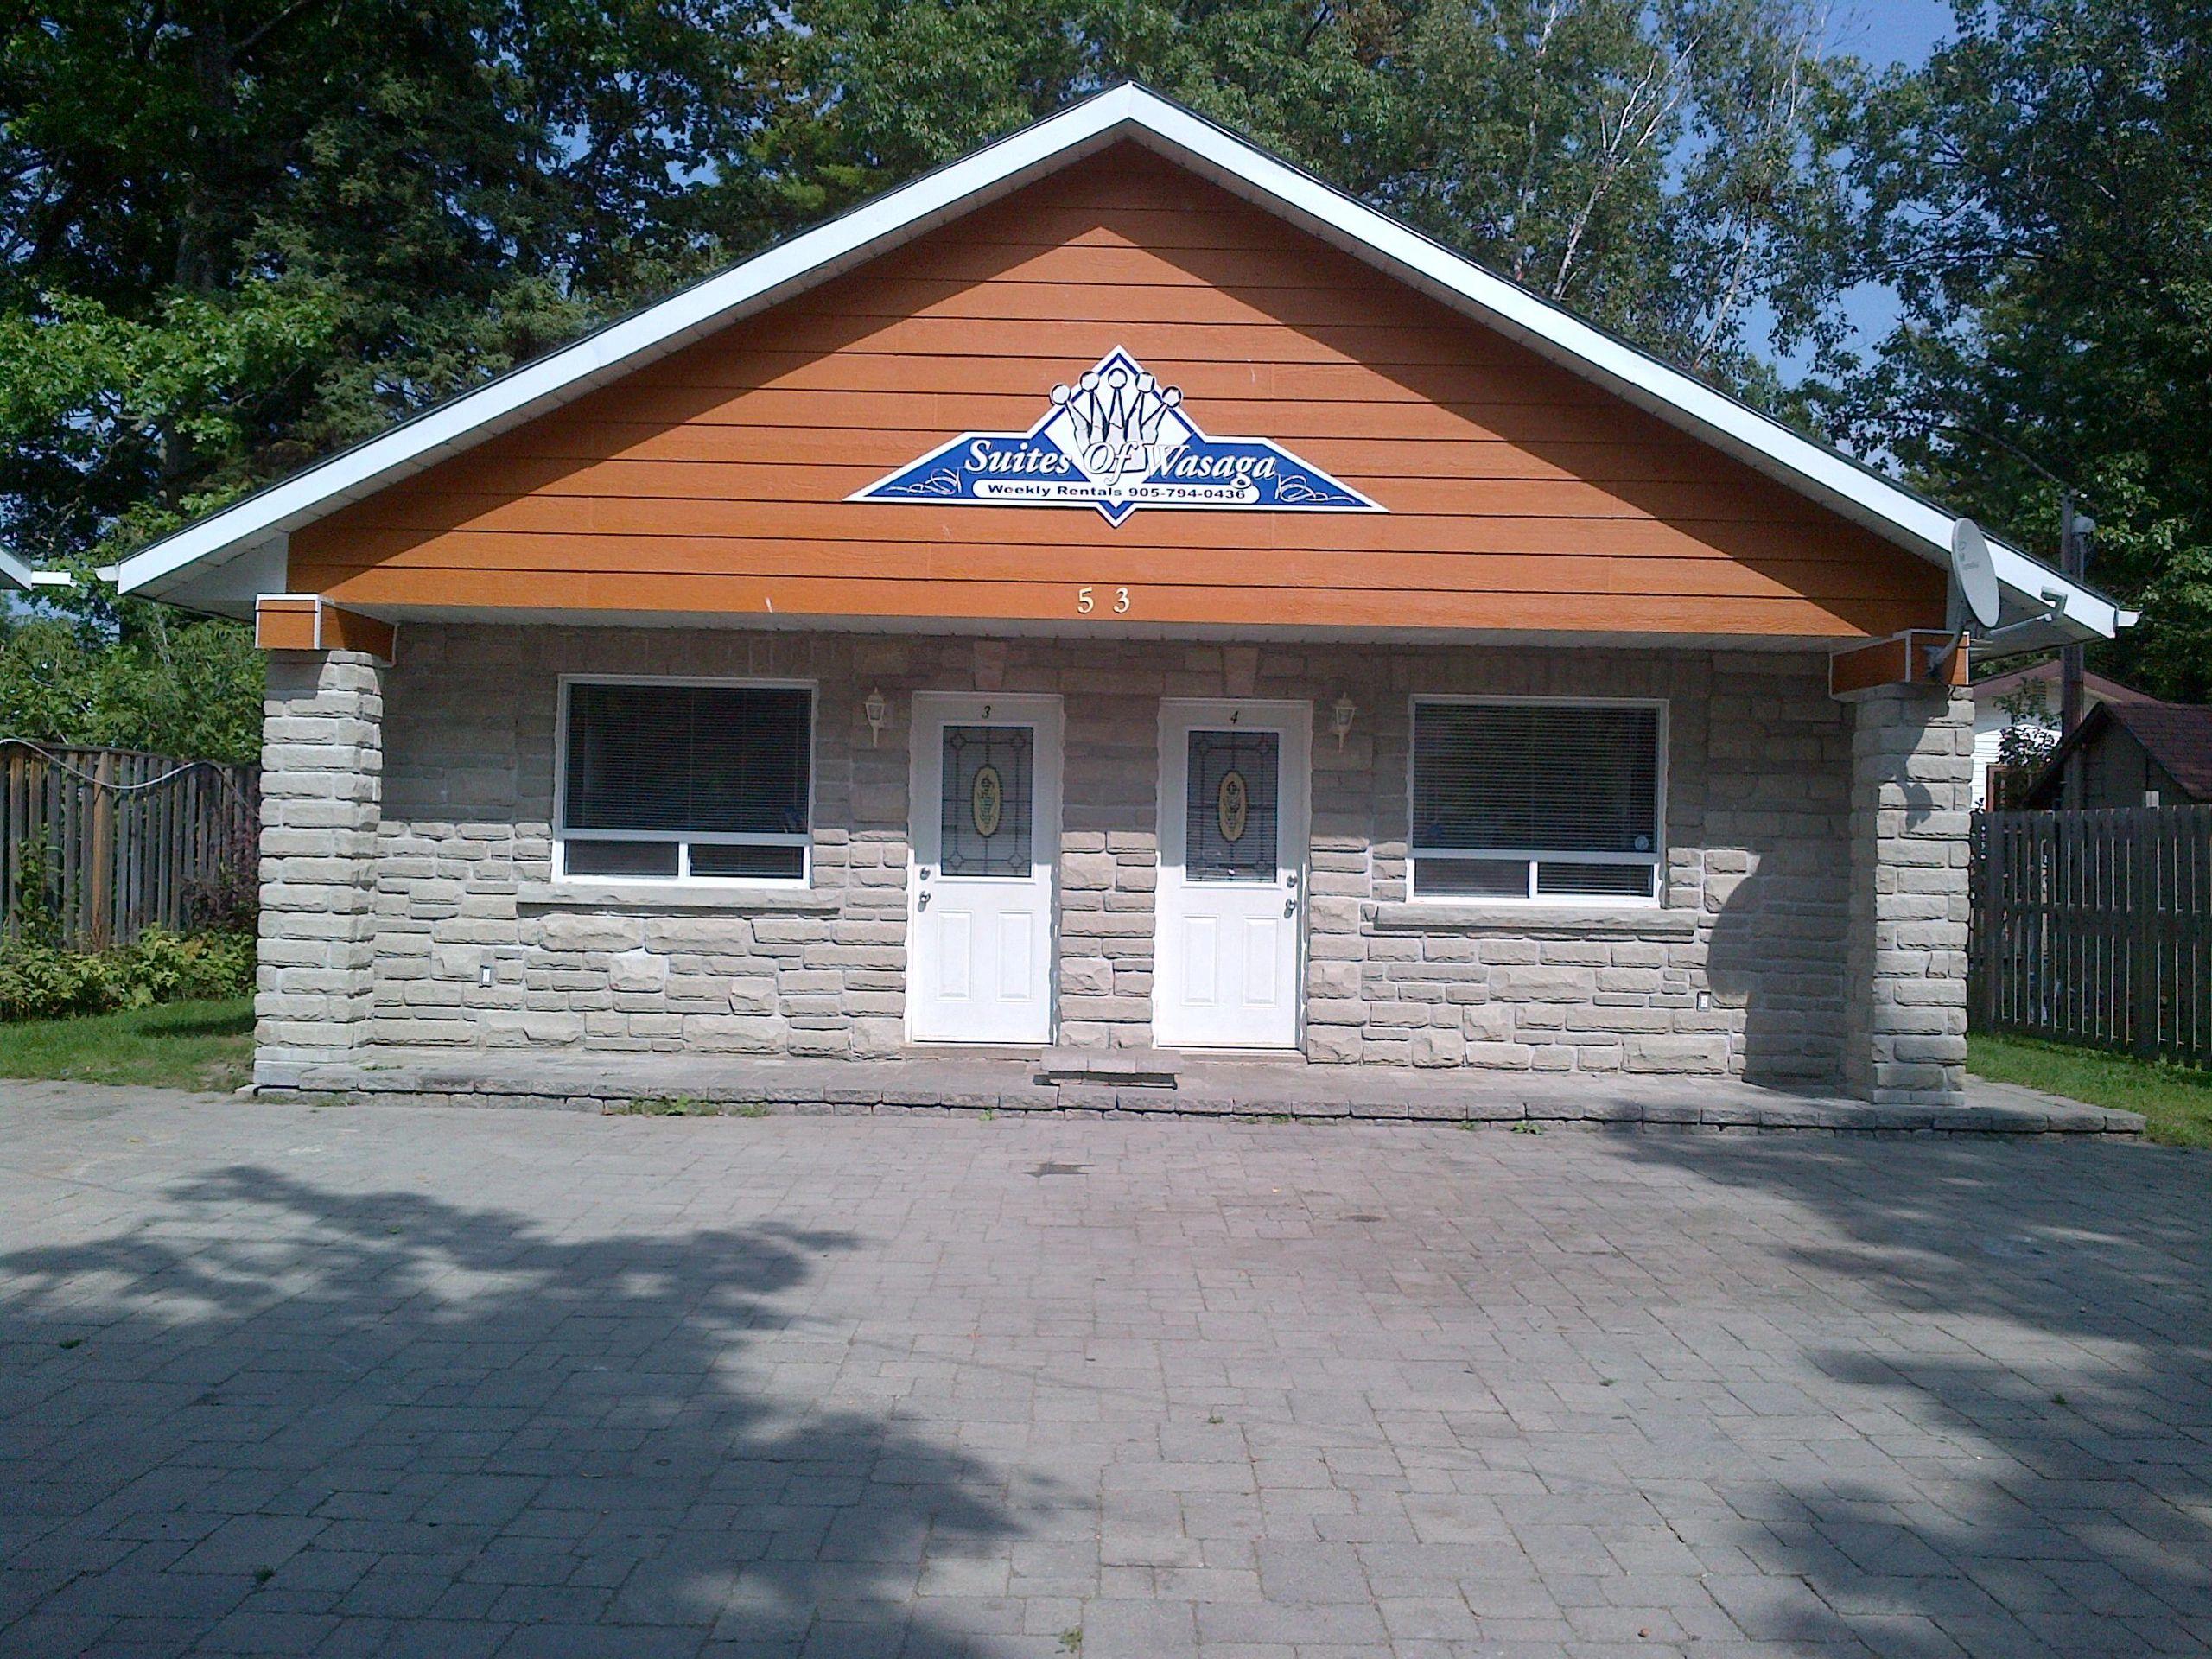 rv activities features cottage en banquet cottages rentals ontario countrylife ca hall wasaga beach